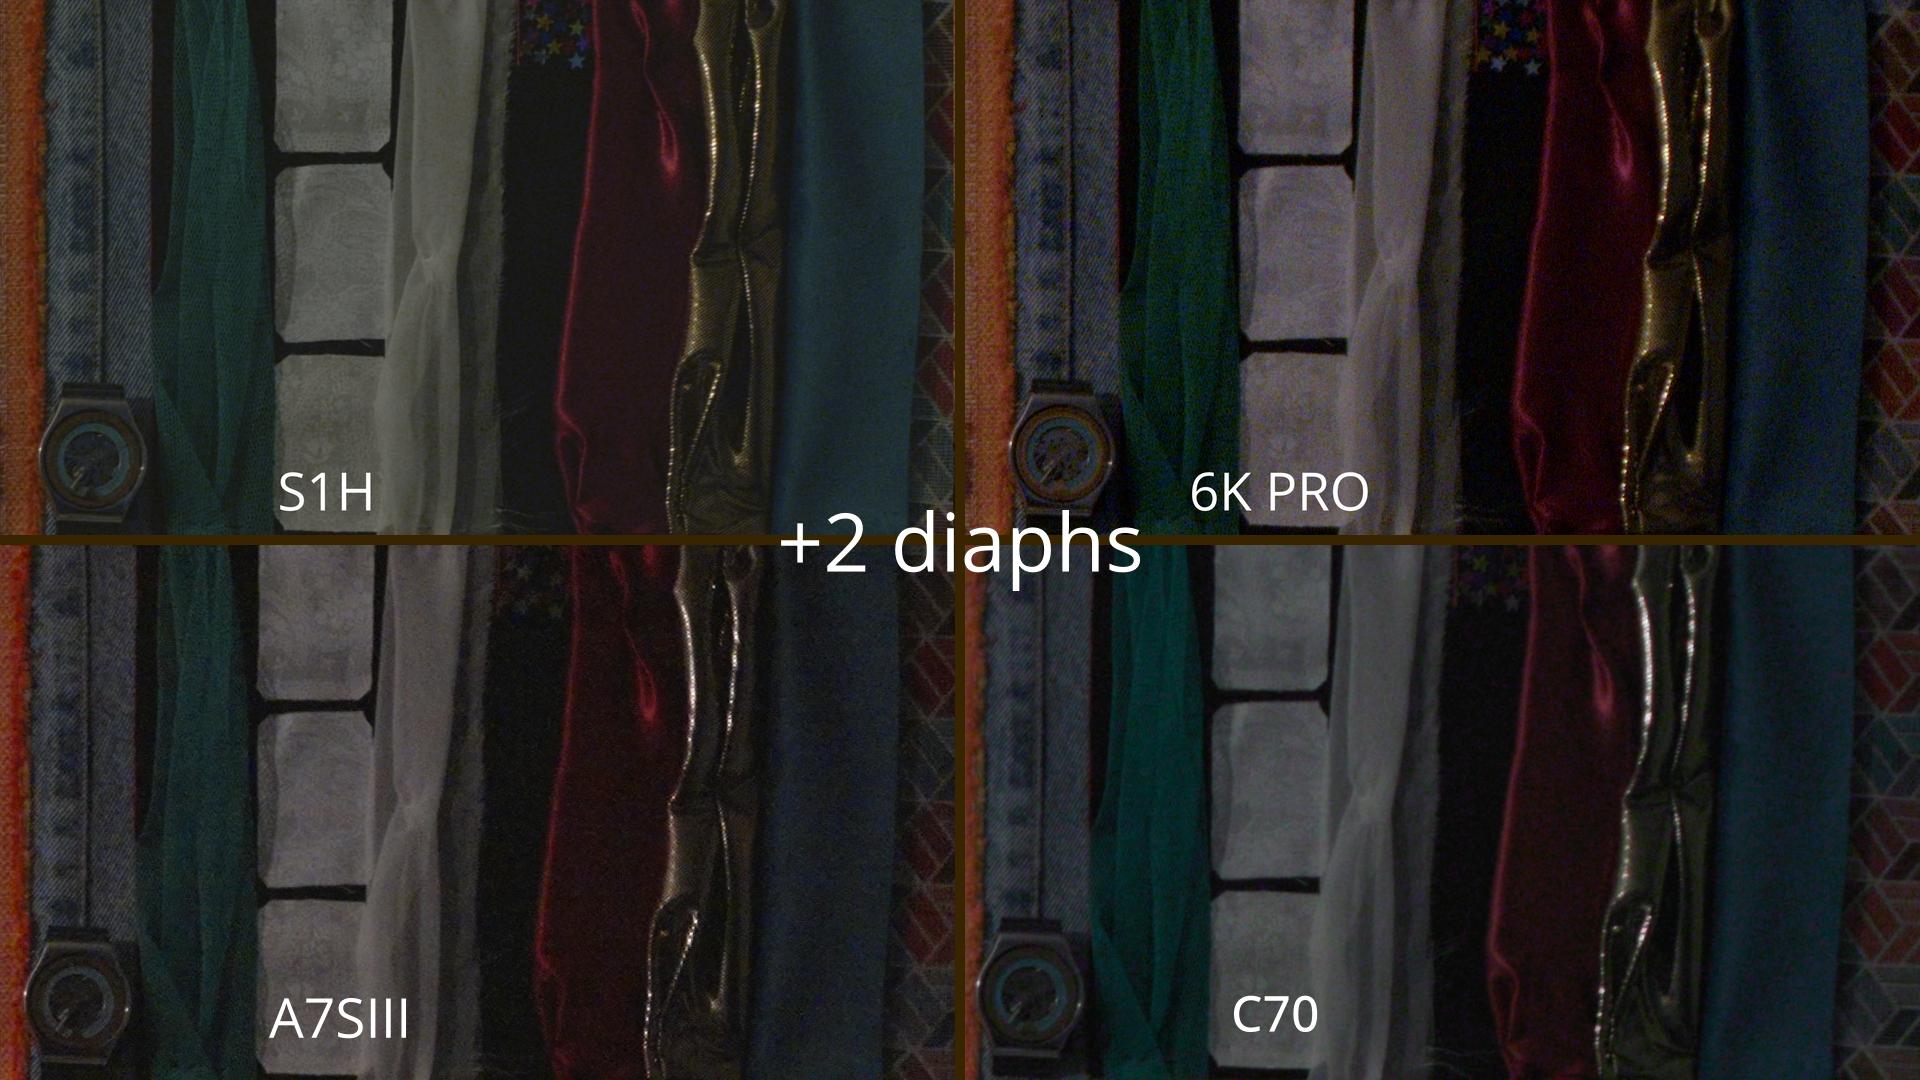 6K PRO tissus 2 comp LL_4.23.1.jpg